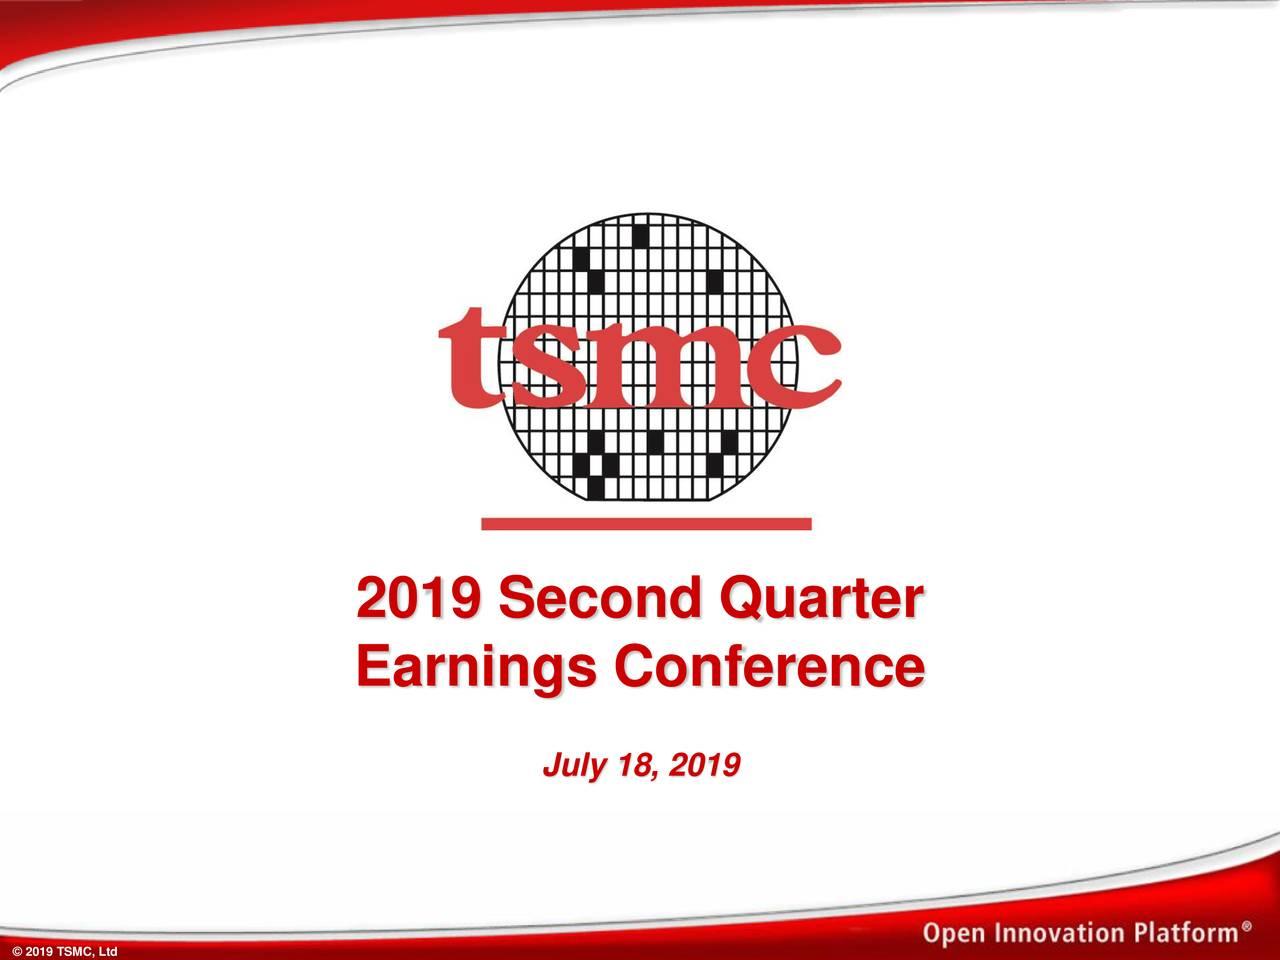 TSMC Earnings solid, HPC leads growth | SemiWiki